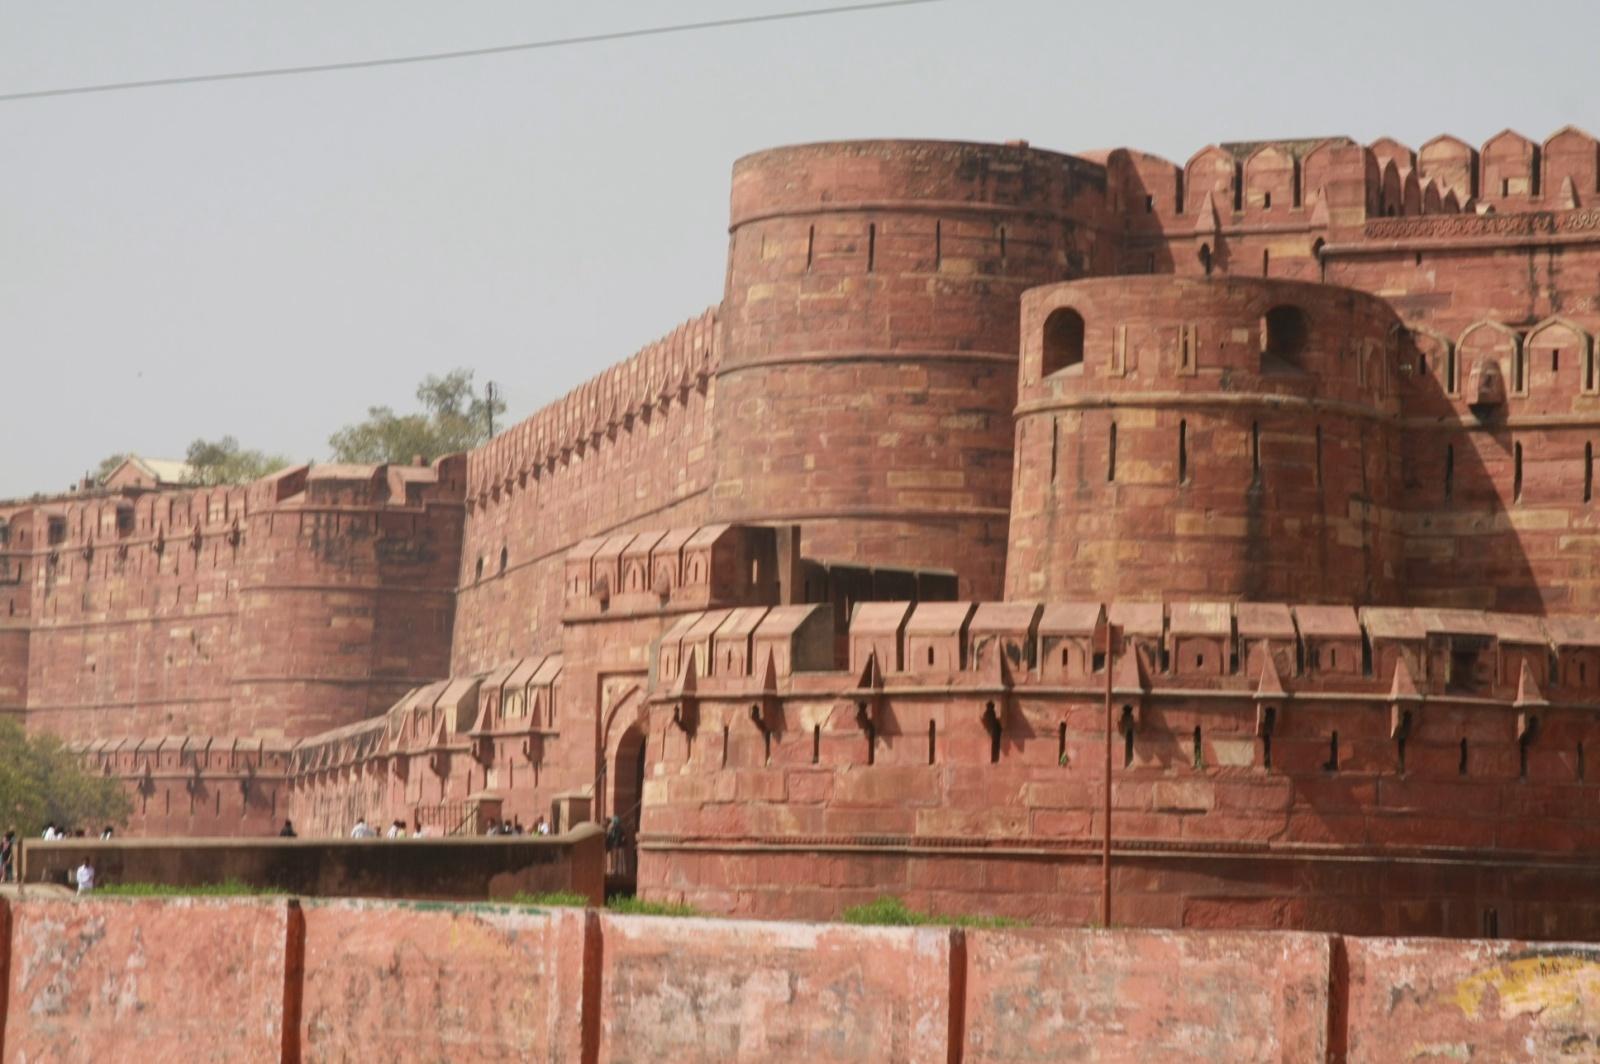 Northern India